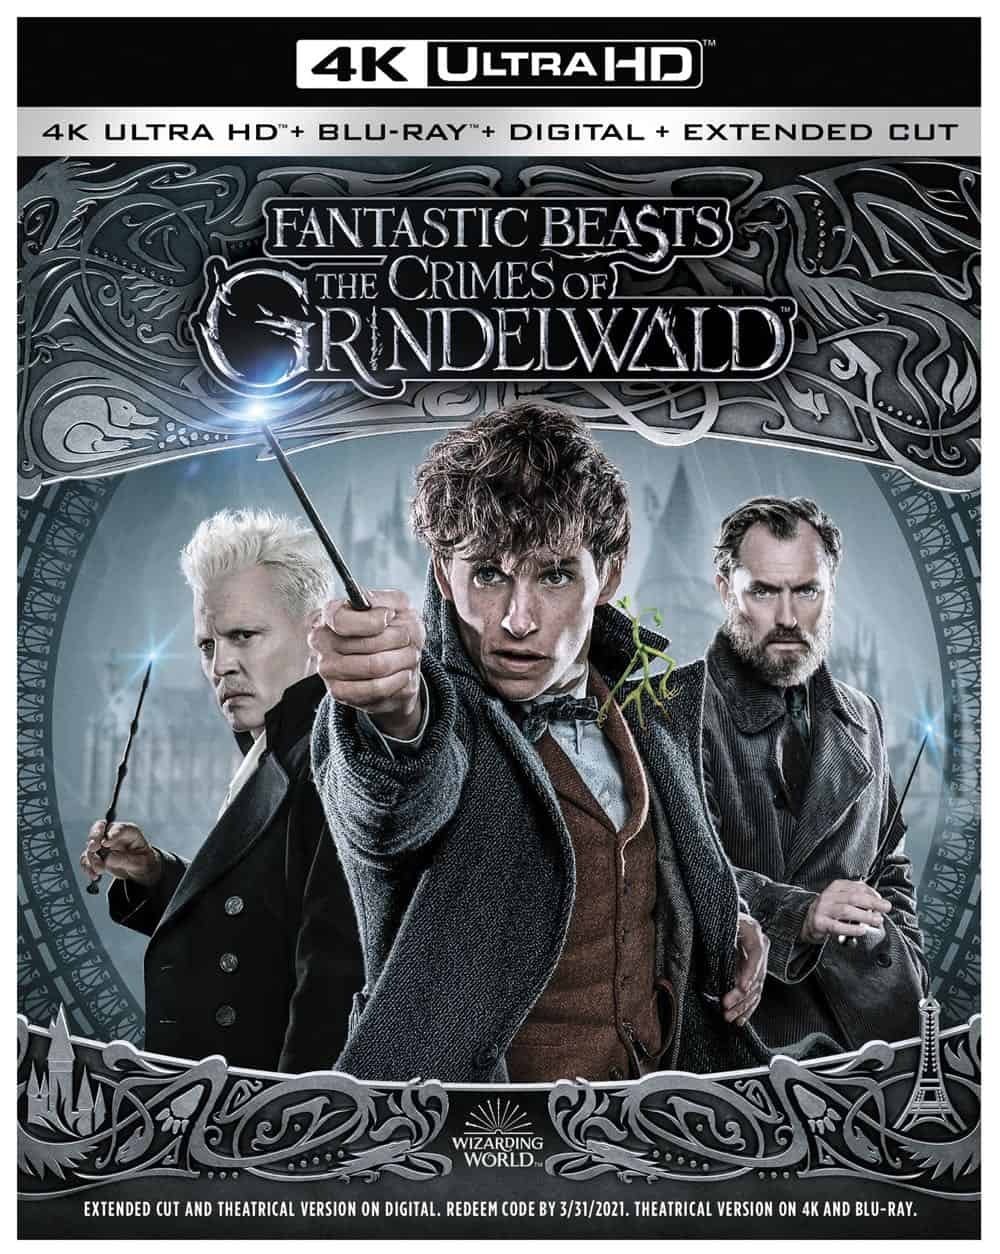 Fantastic Beasts The Crimes of Grindelwald 4K Bluray DVD Digital 1